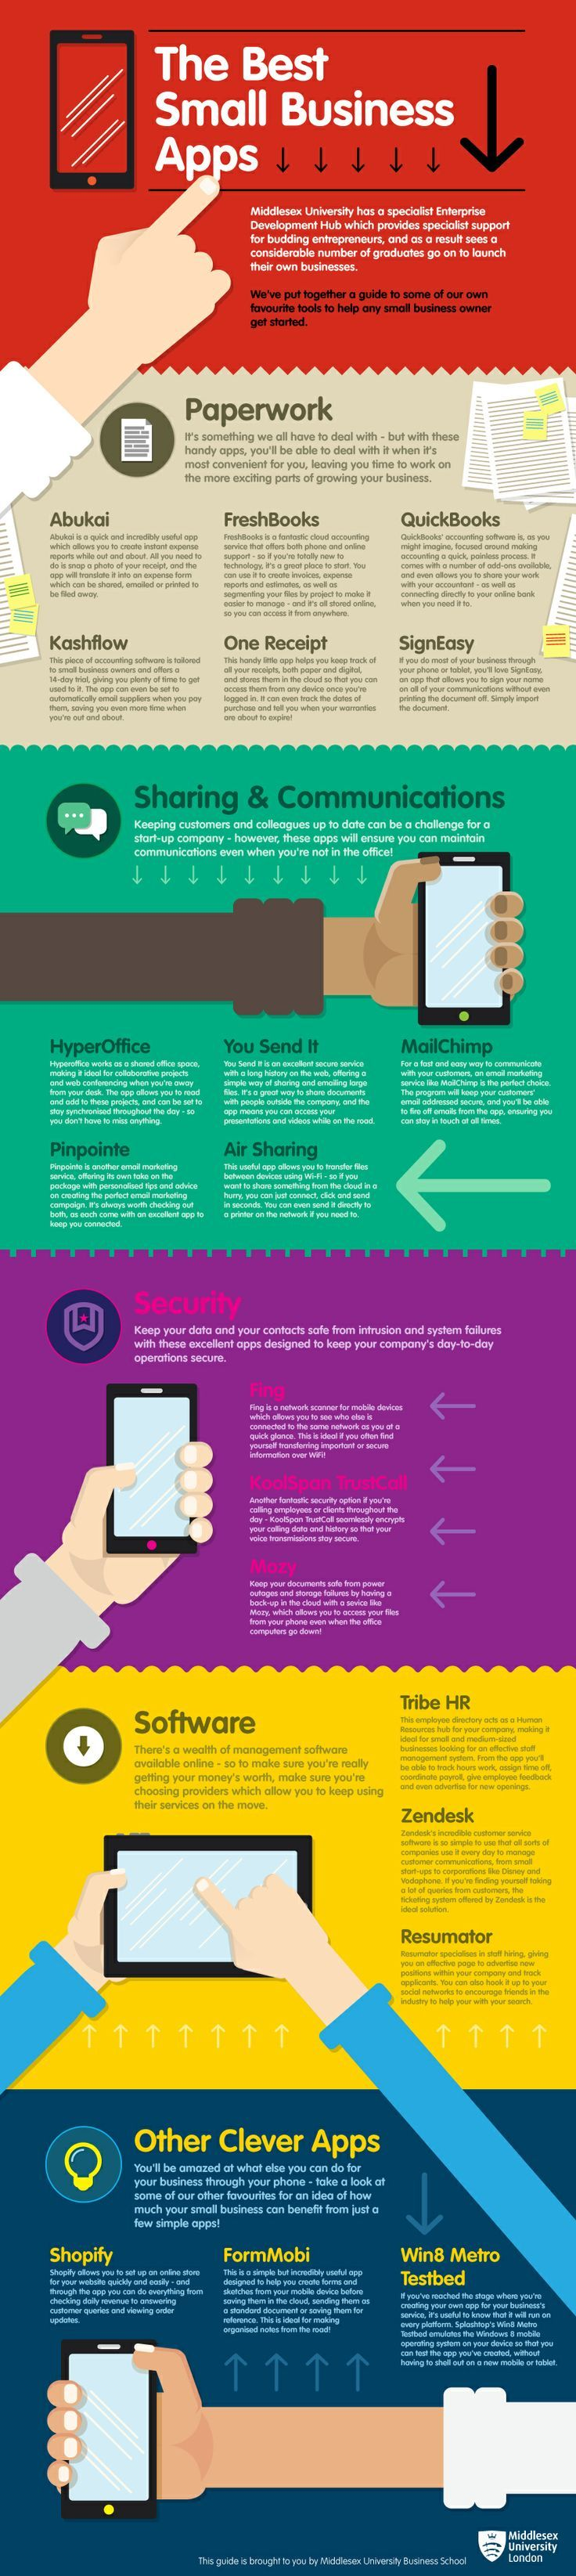 20 mejores Apps para pequeñas empresas #infografia #infographic business ideas #smallbusiness small business ideas wahm ideas